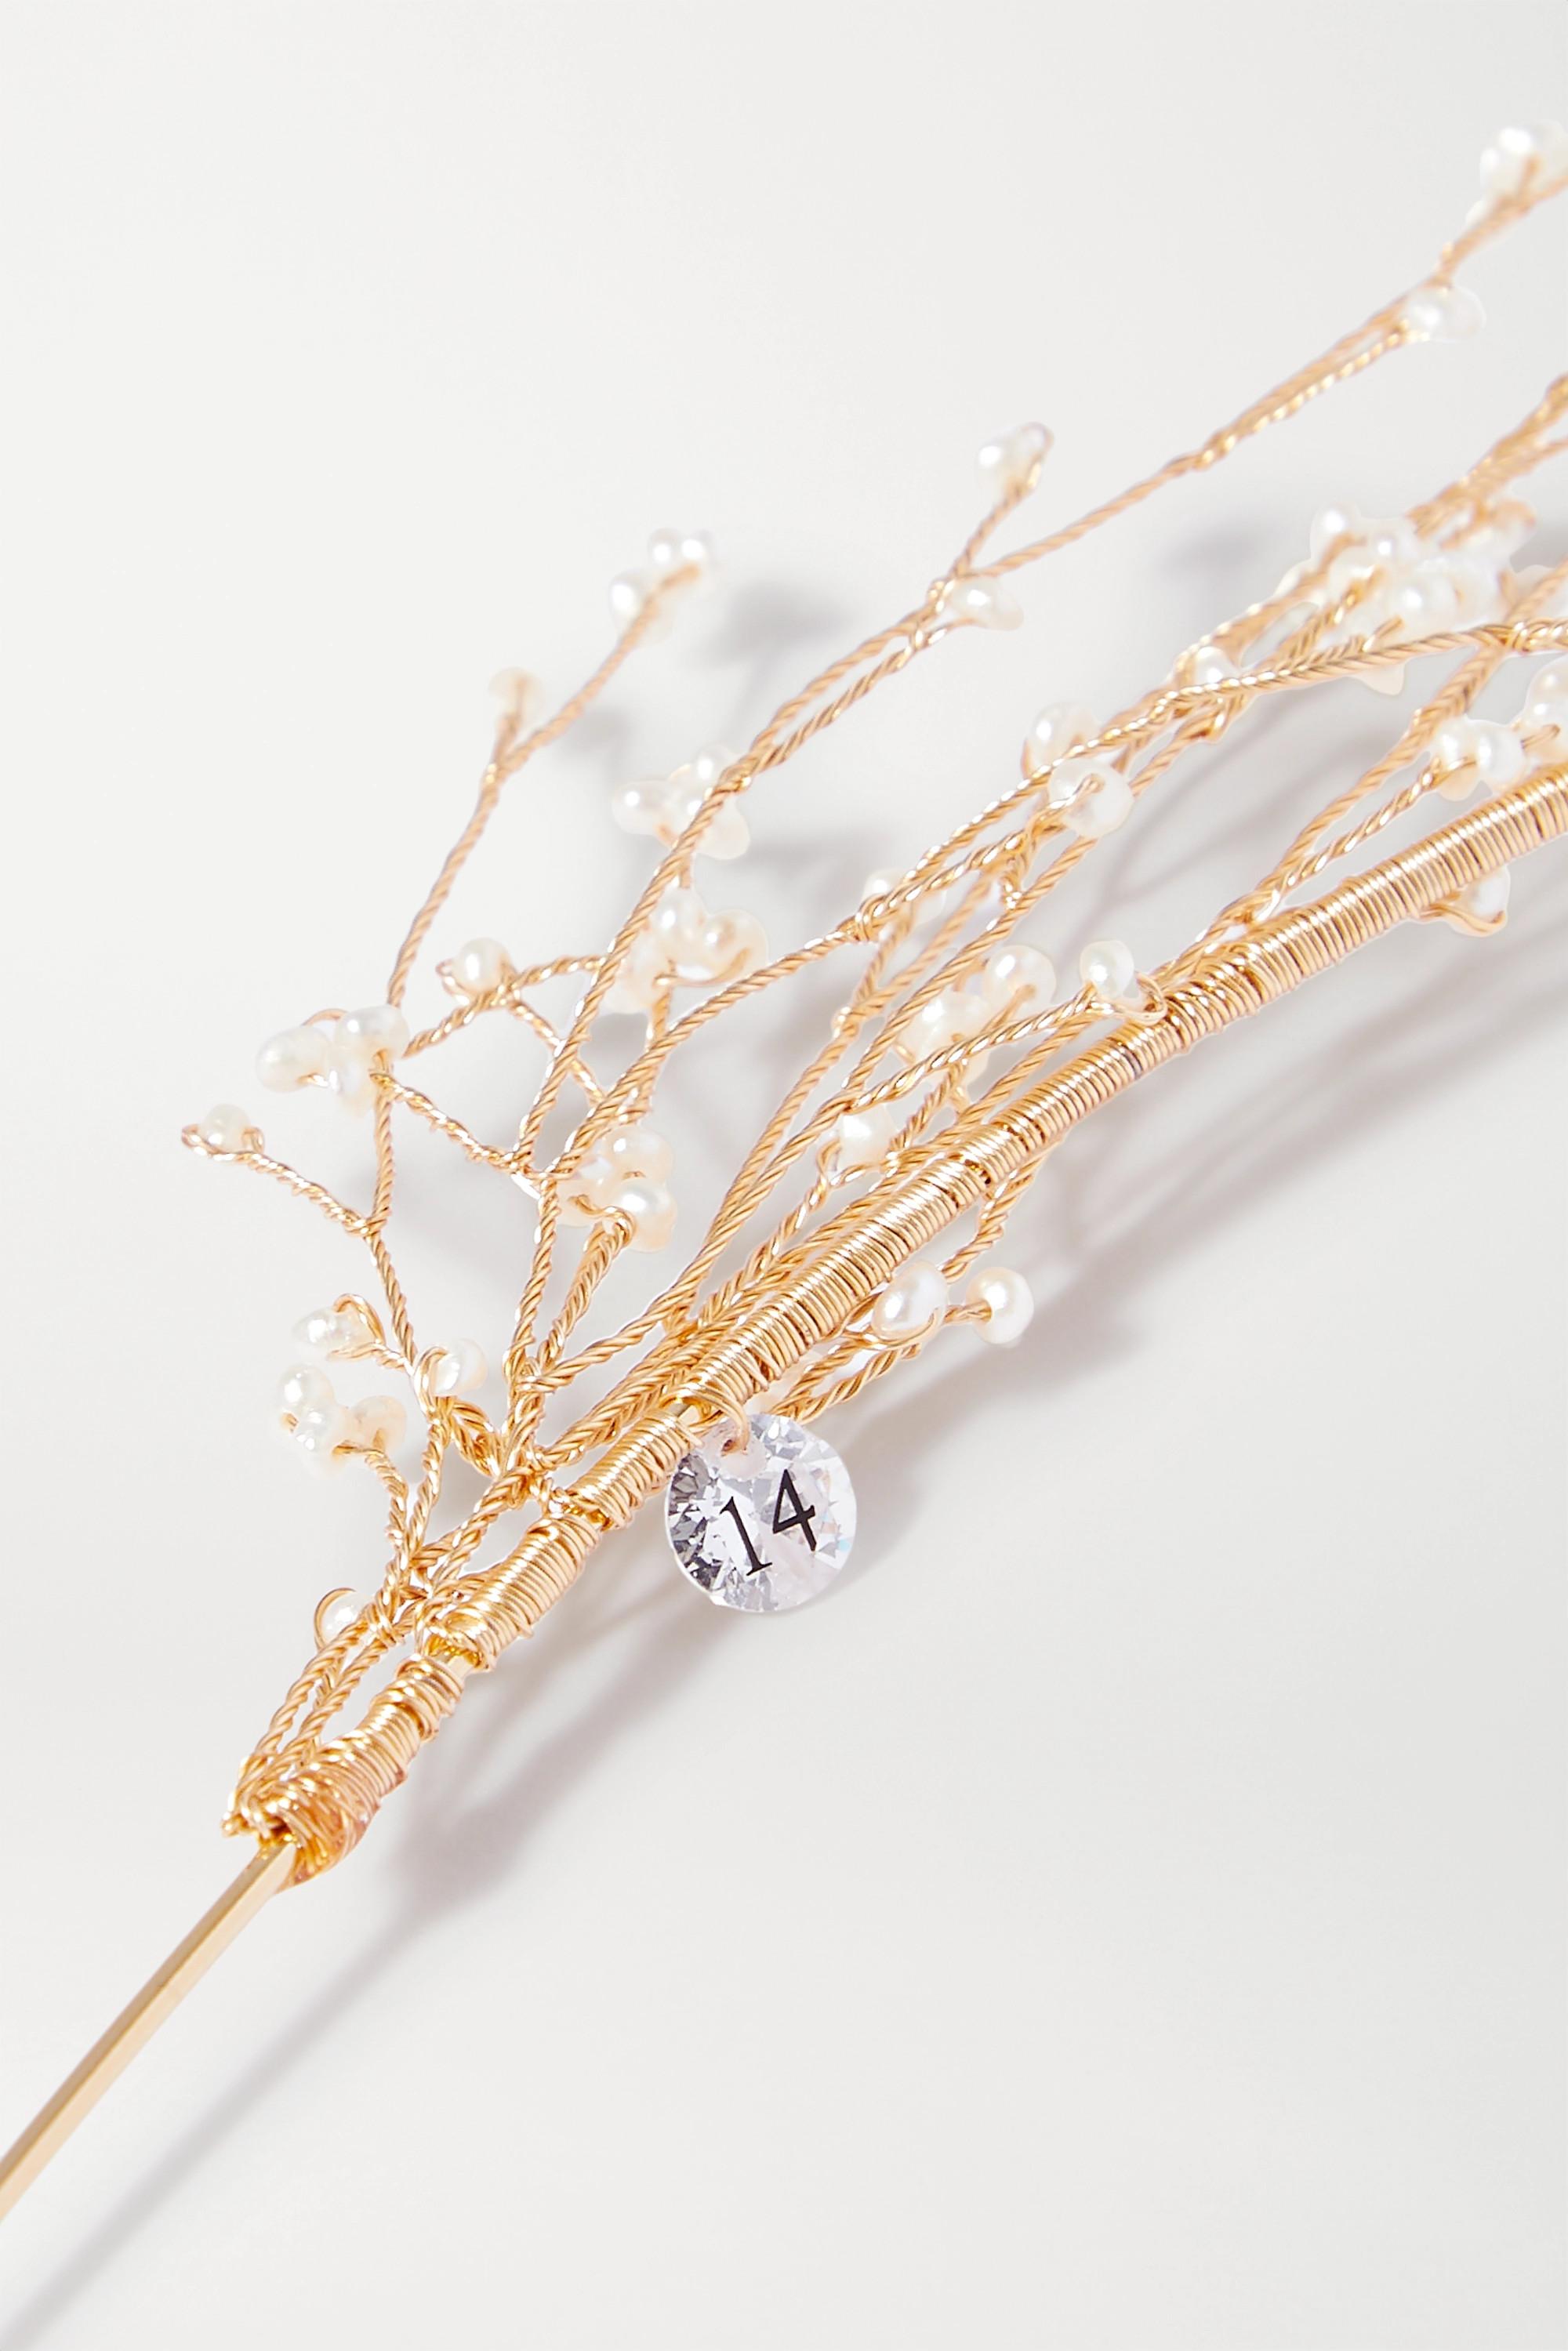 14 / Quatorze Goldfarbener Haarreif mit Perlen